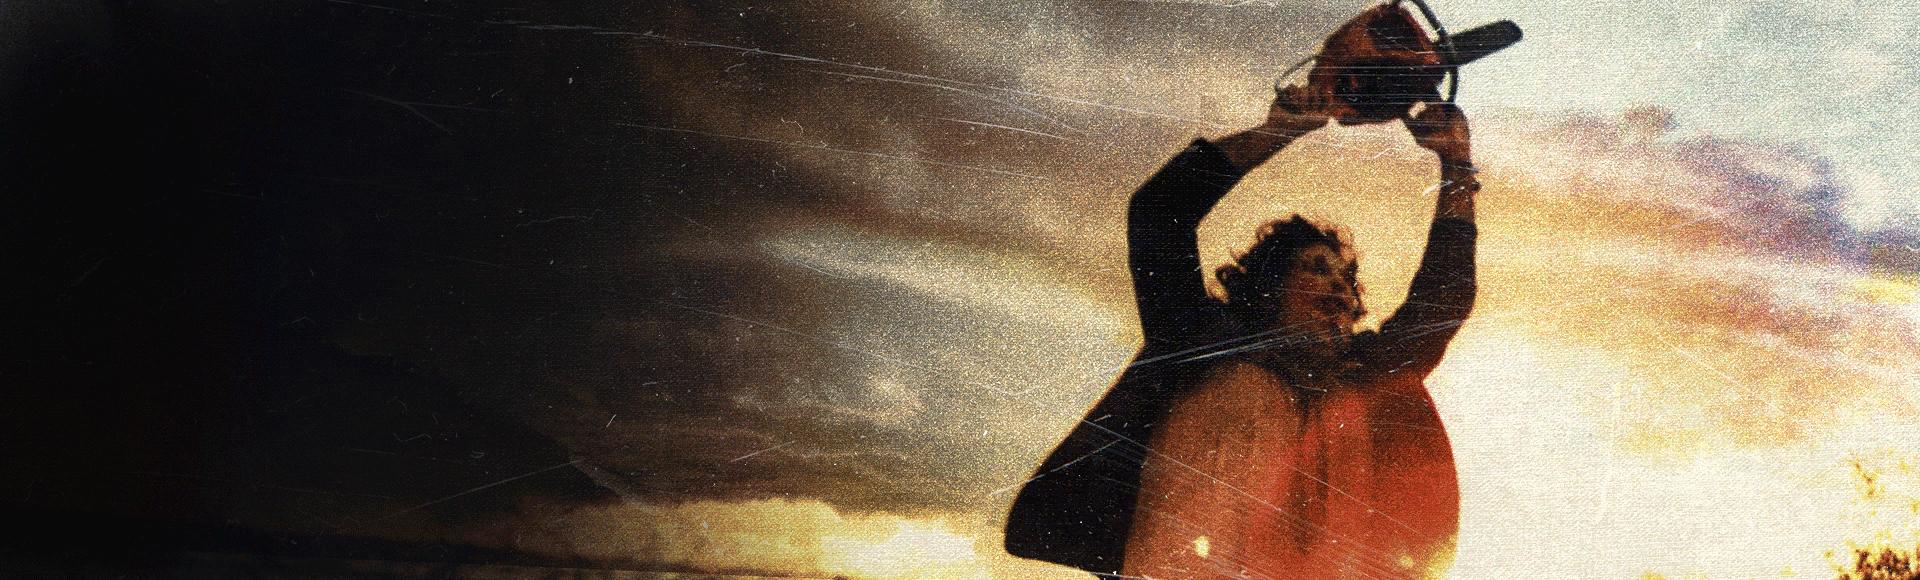 Bundle billboard of The Texas Chainsaw Massacre